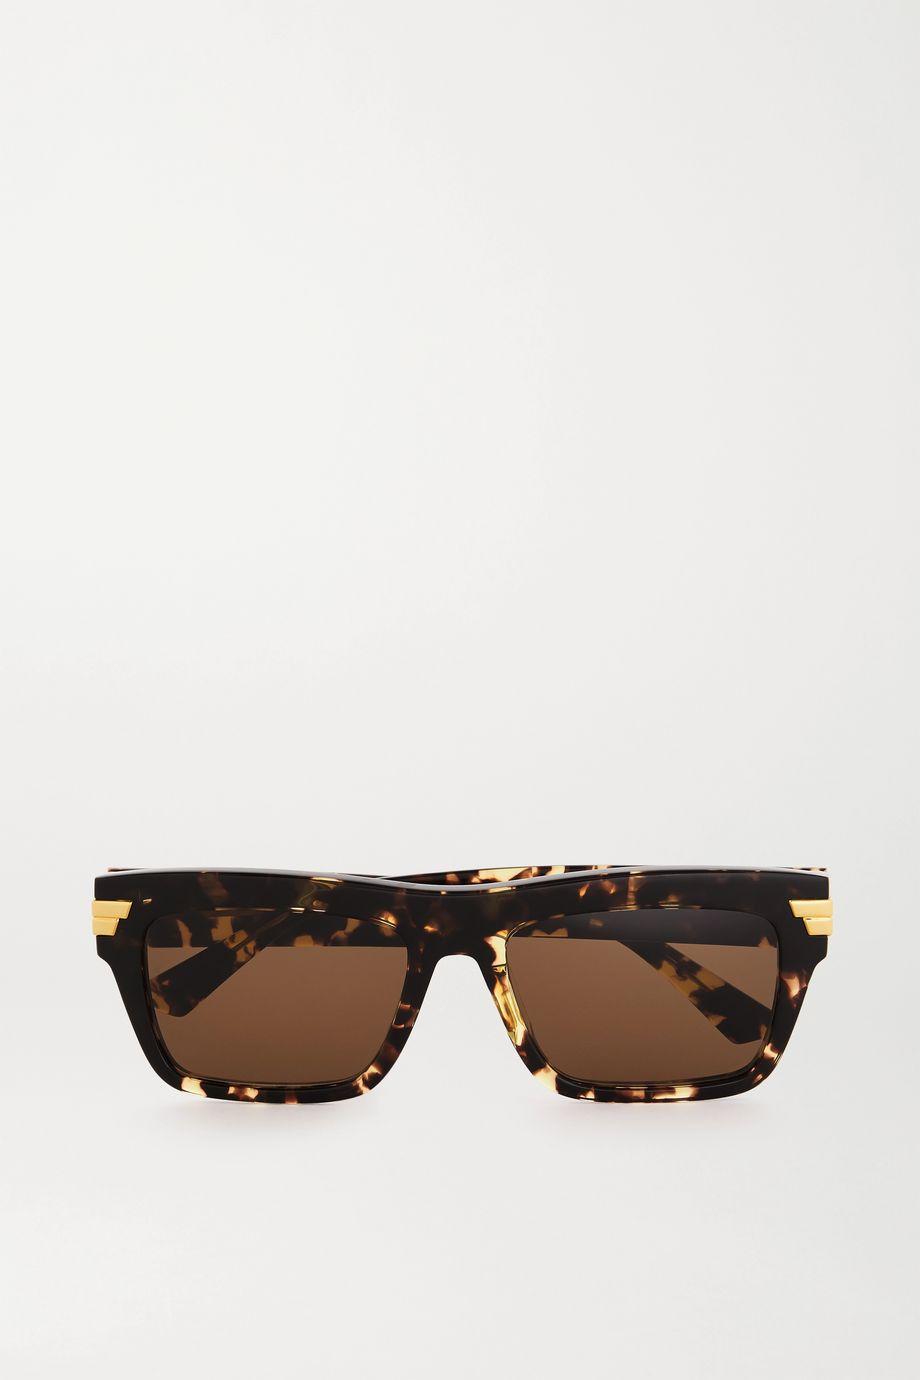 Bottega Veneta Sonnenbrille mit eckigem Rahmen aus Azetat in Hornoptik